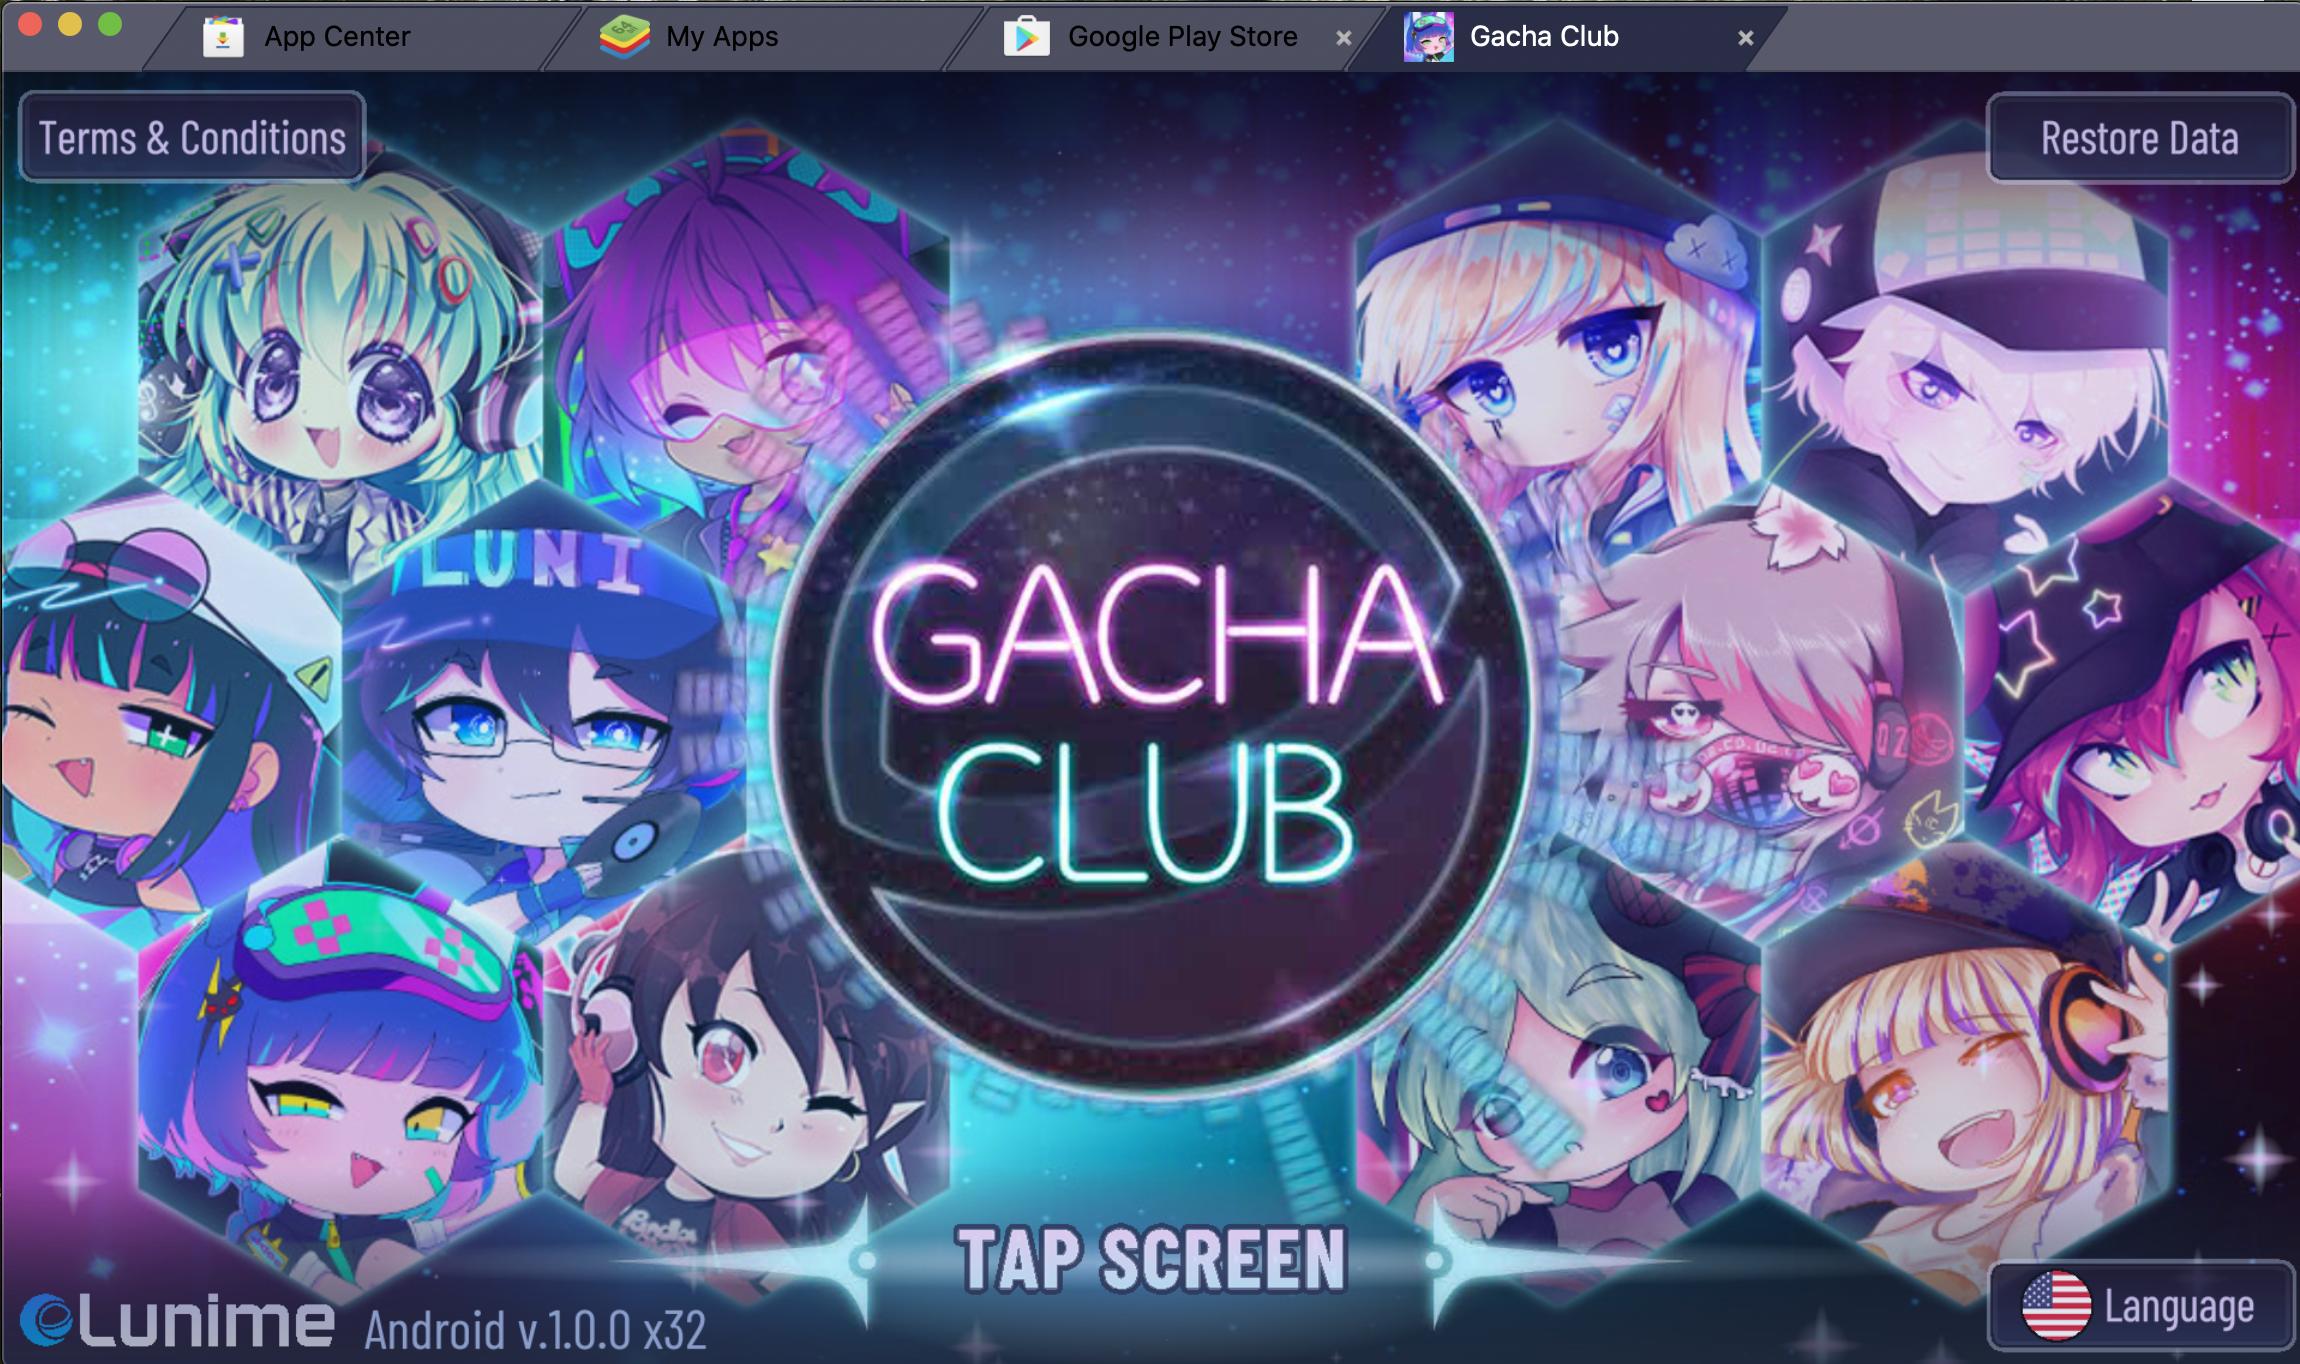 Bluestacks Screenshot showing Gacha Club splash page